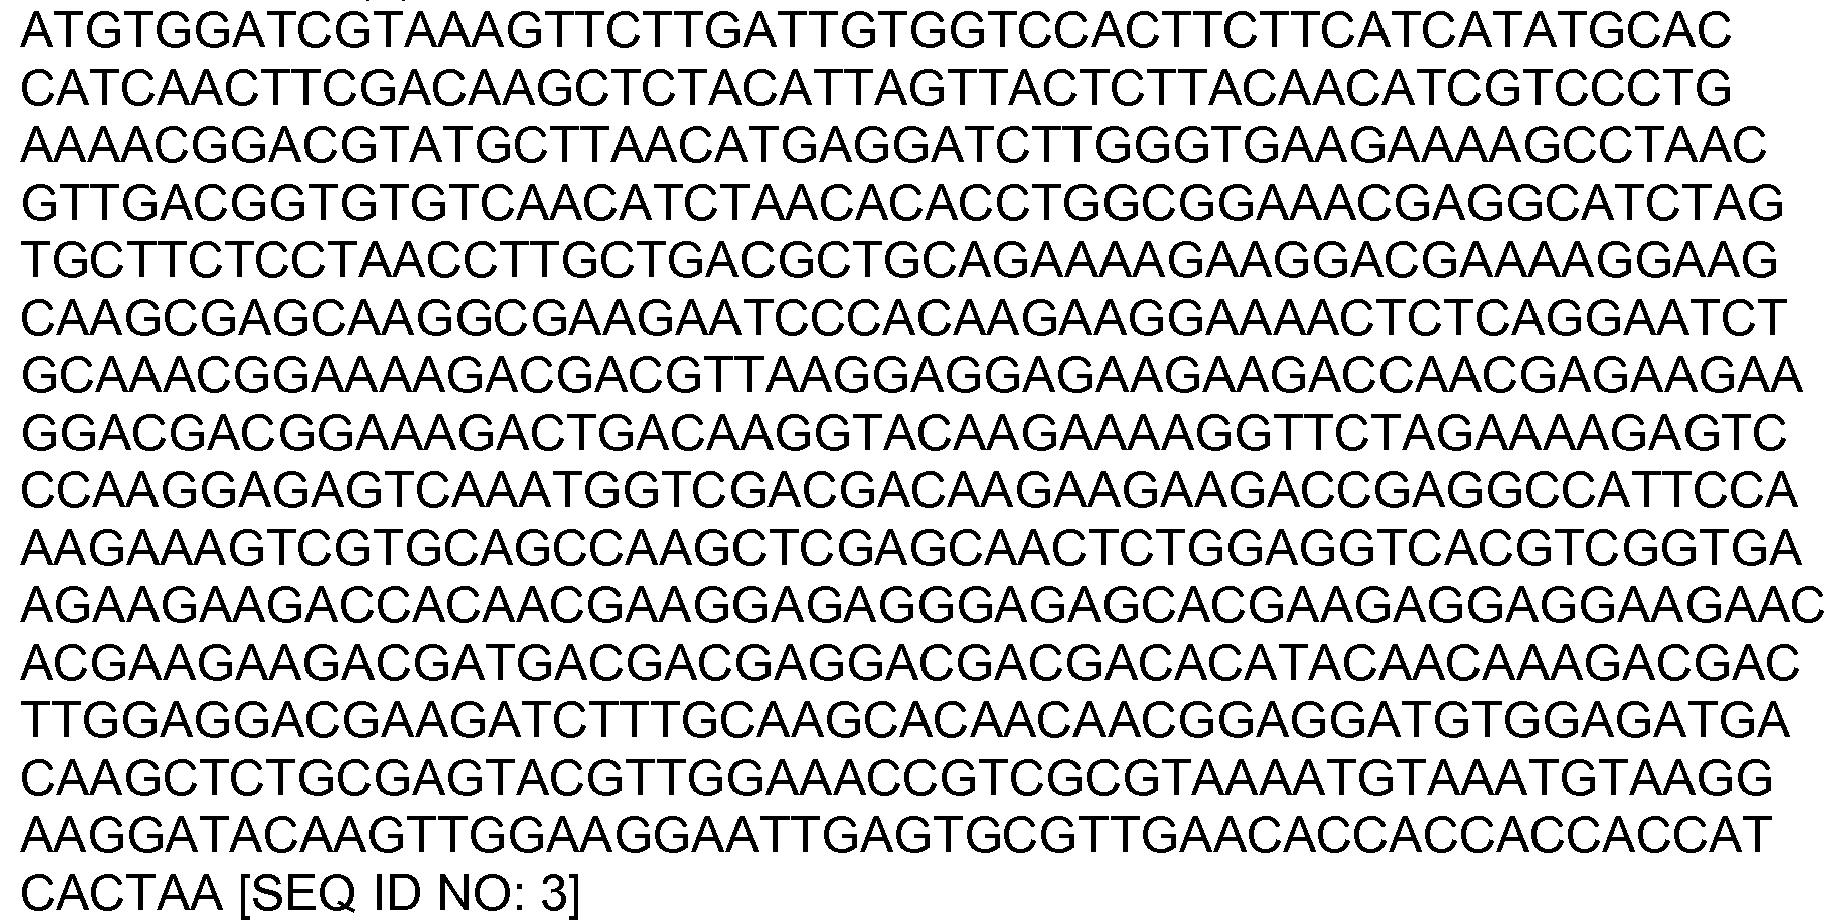 patent epa recombinant plasmodium falciparum merozoite  patent ep2329844a1 recombinant plasmodium falciparum merozoite surface proteins 4 and 5 and patents